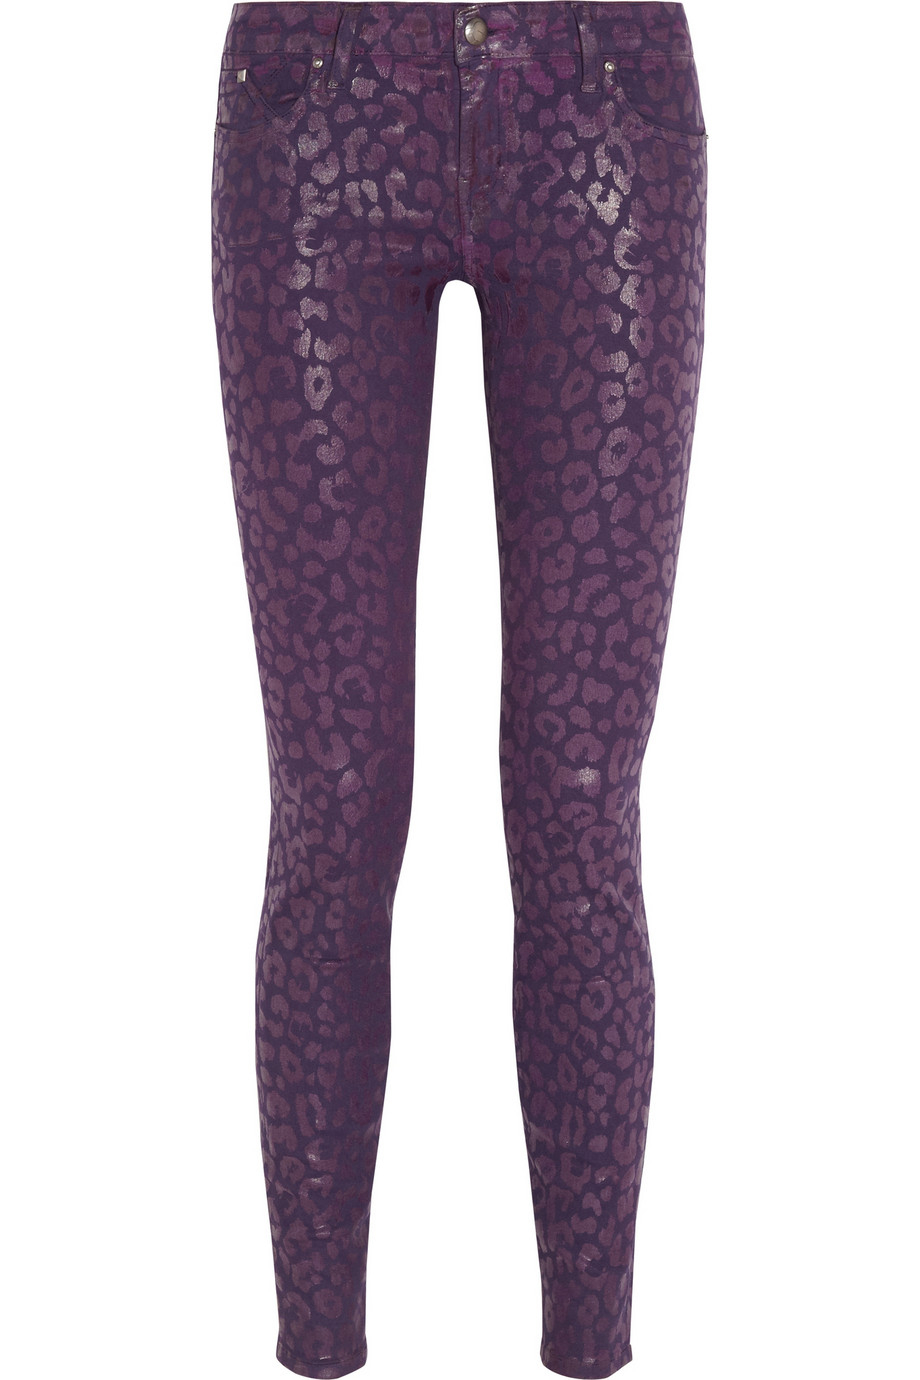 Karl lagerfeld Courtney Animal-Print Skinny Jeans in Purple | Lyst